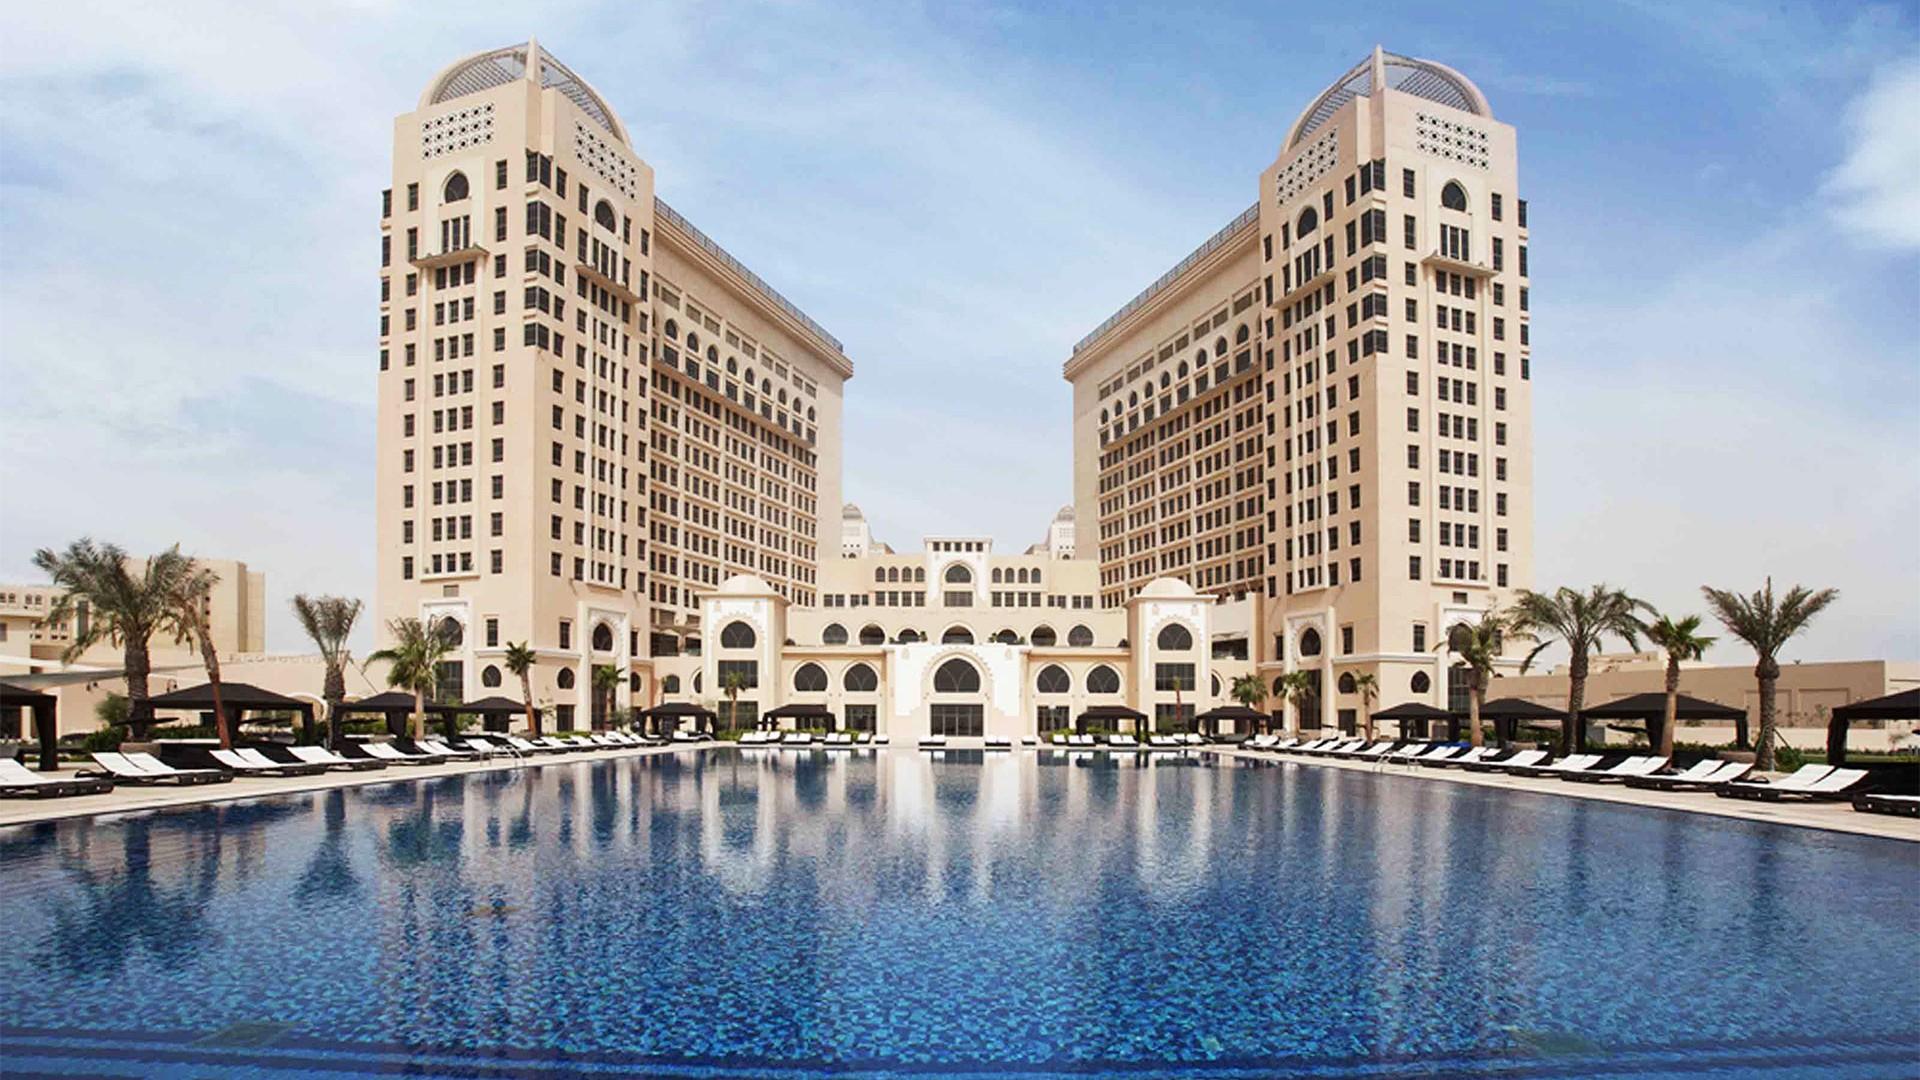 Pool at St Regis Hotel Doha